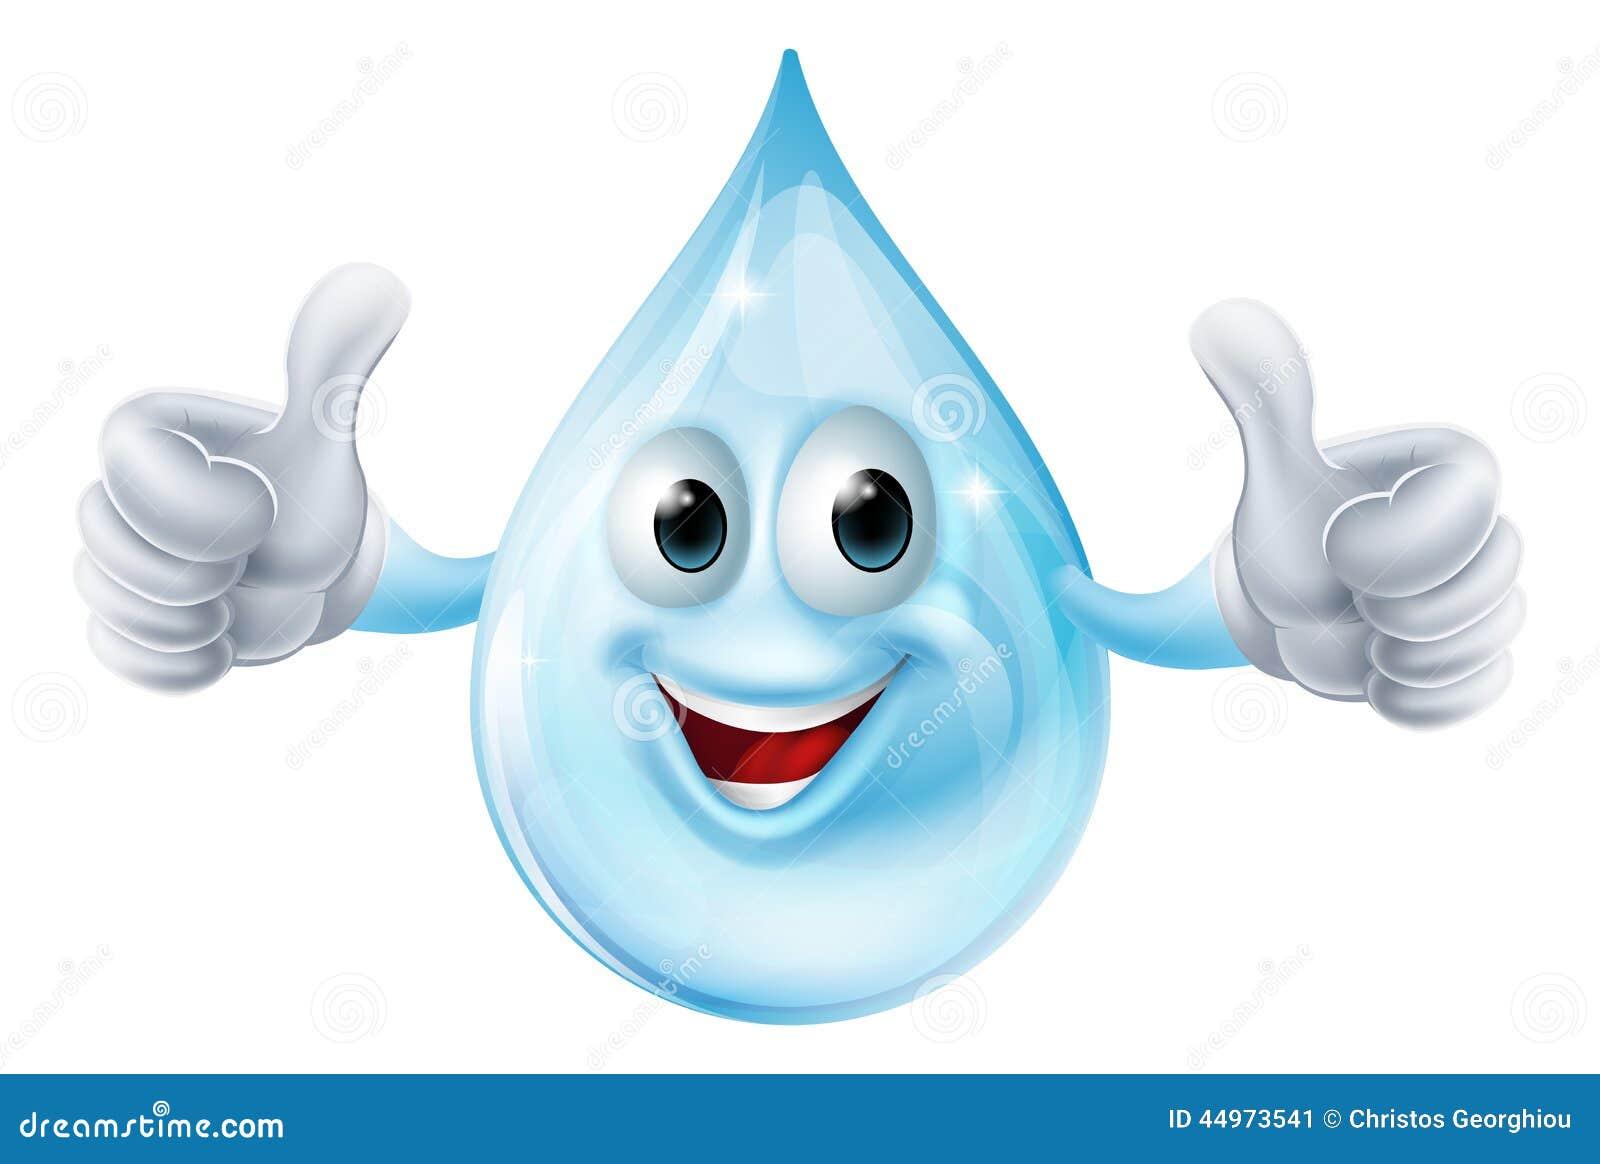 Wassertropfencharakter